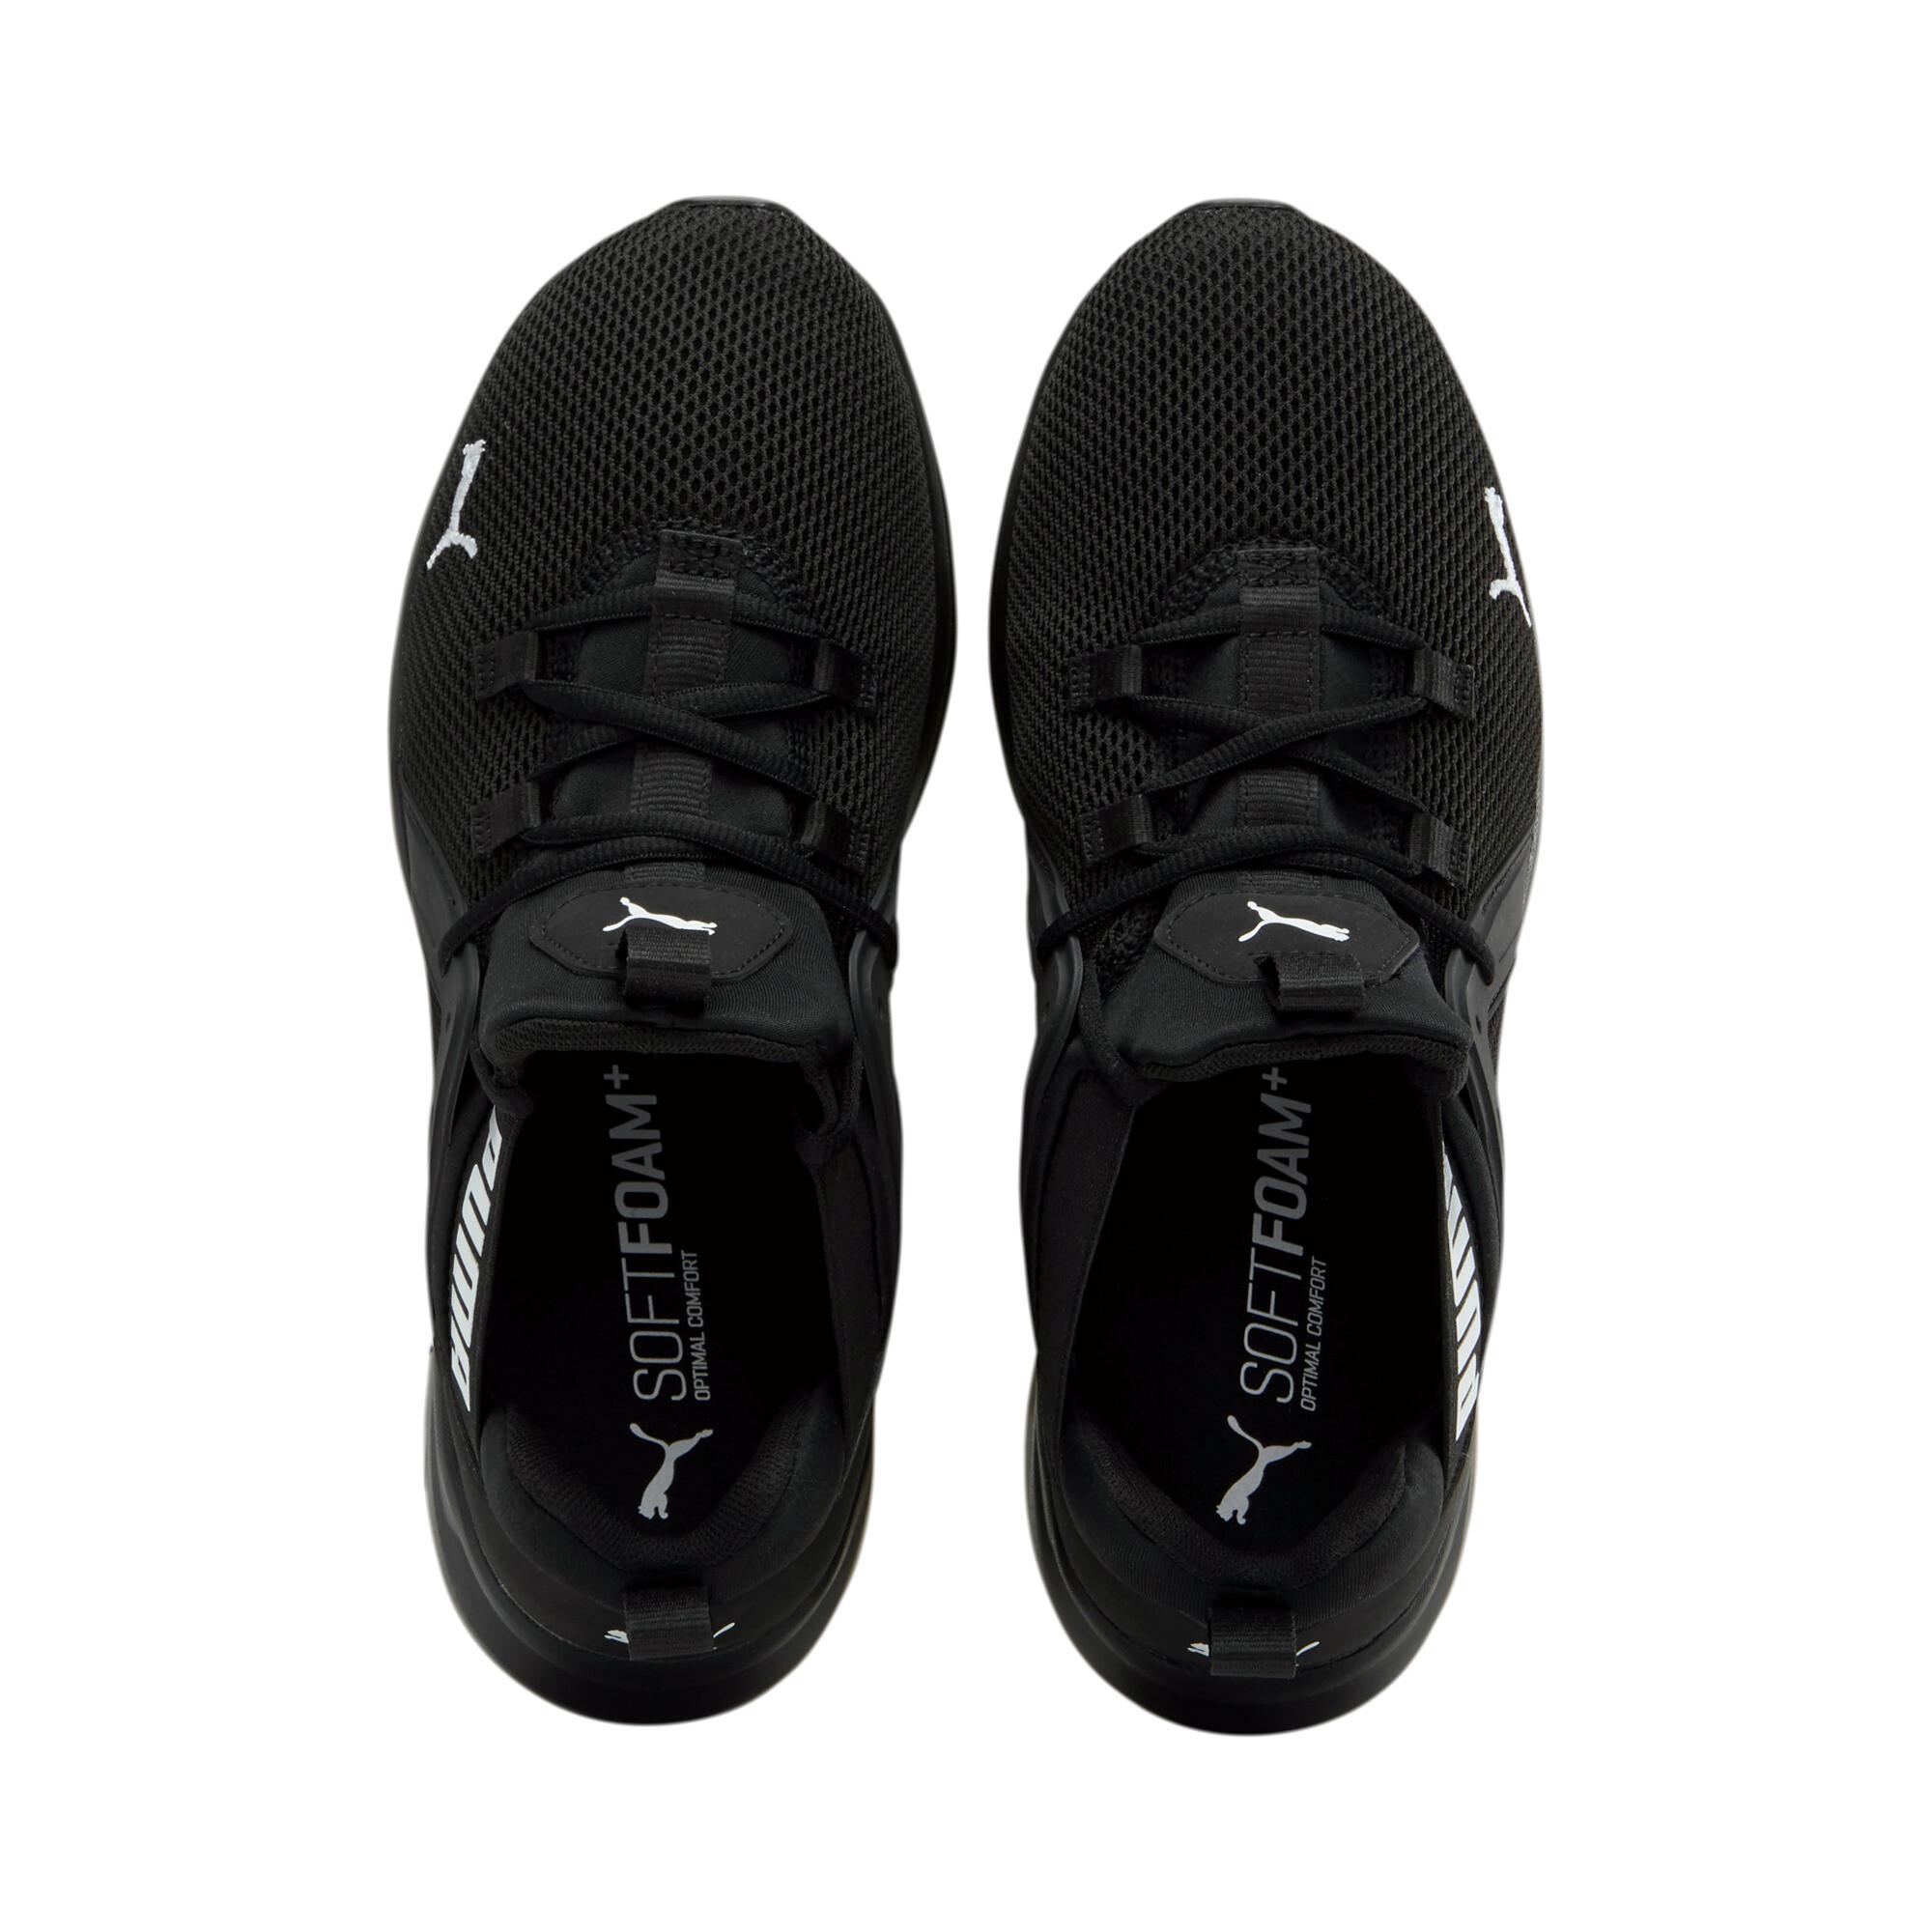 PUMA-Men-039-s-Enzo-2-Wide-Training-Shoes thumbnail 8